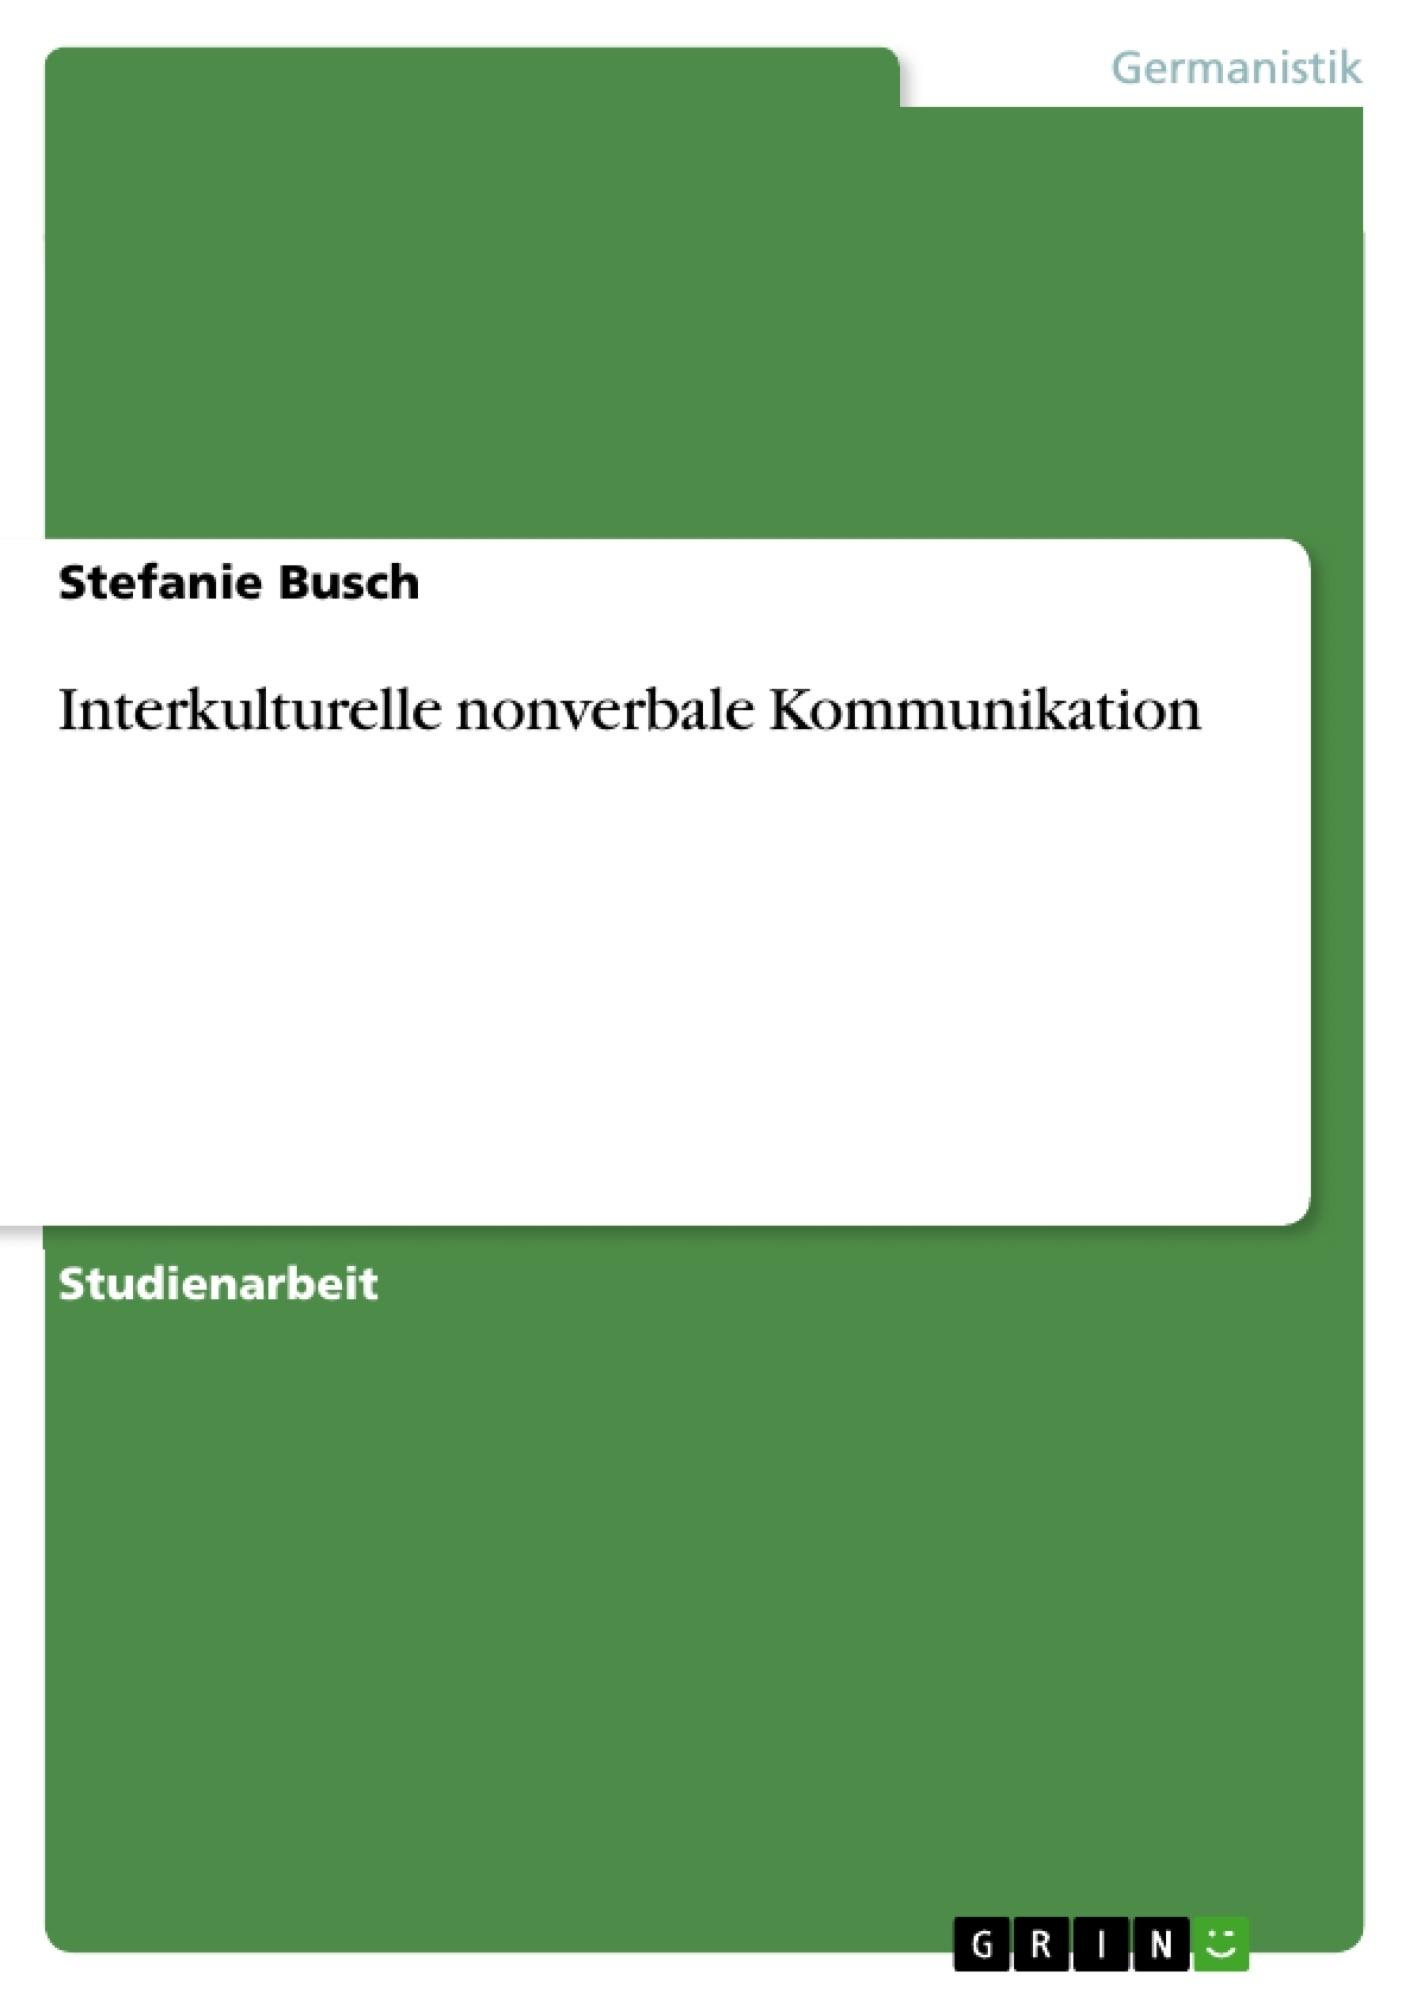 Titel: Interkulturelle nonverbale Kommunikation